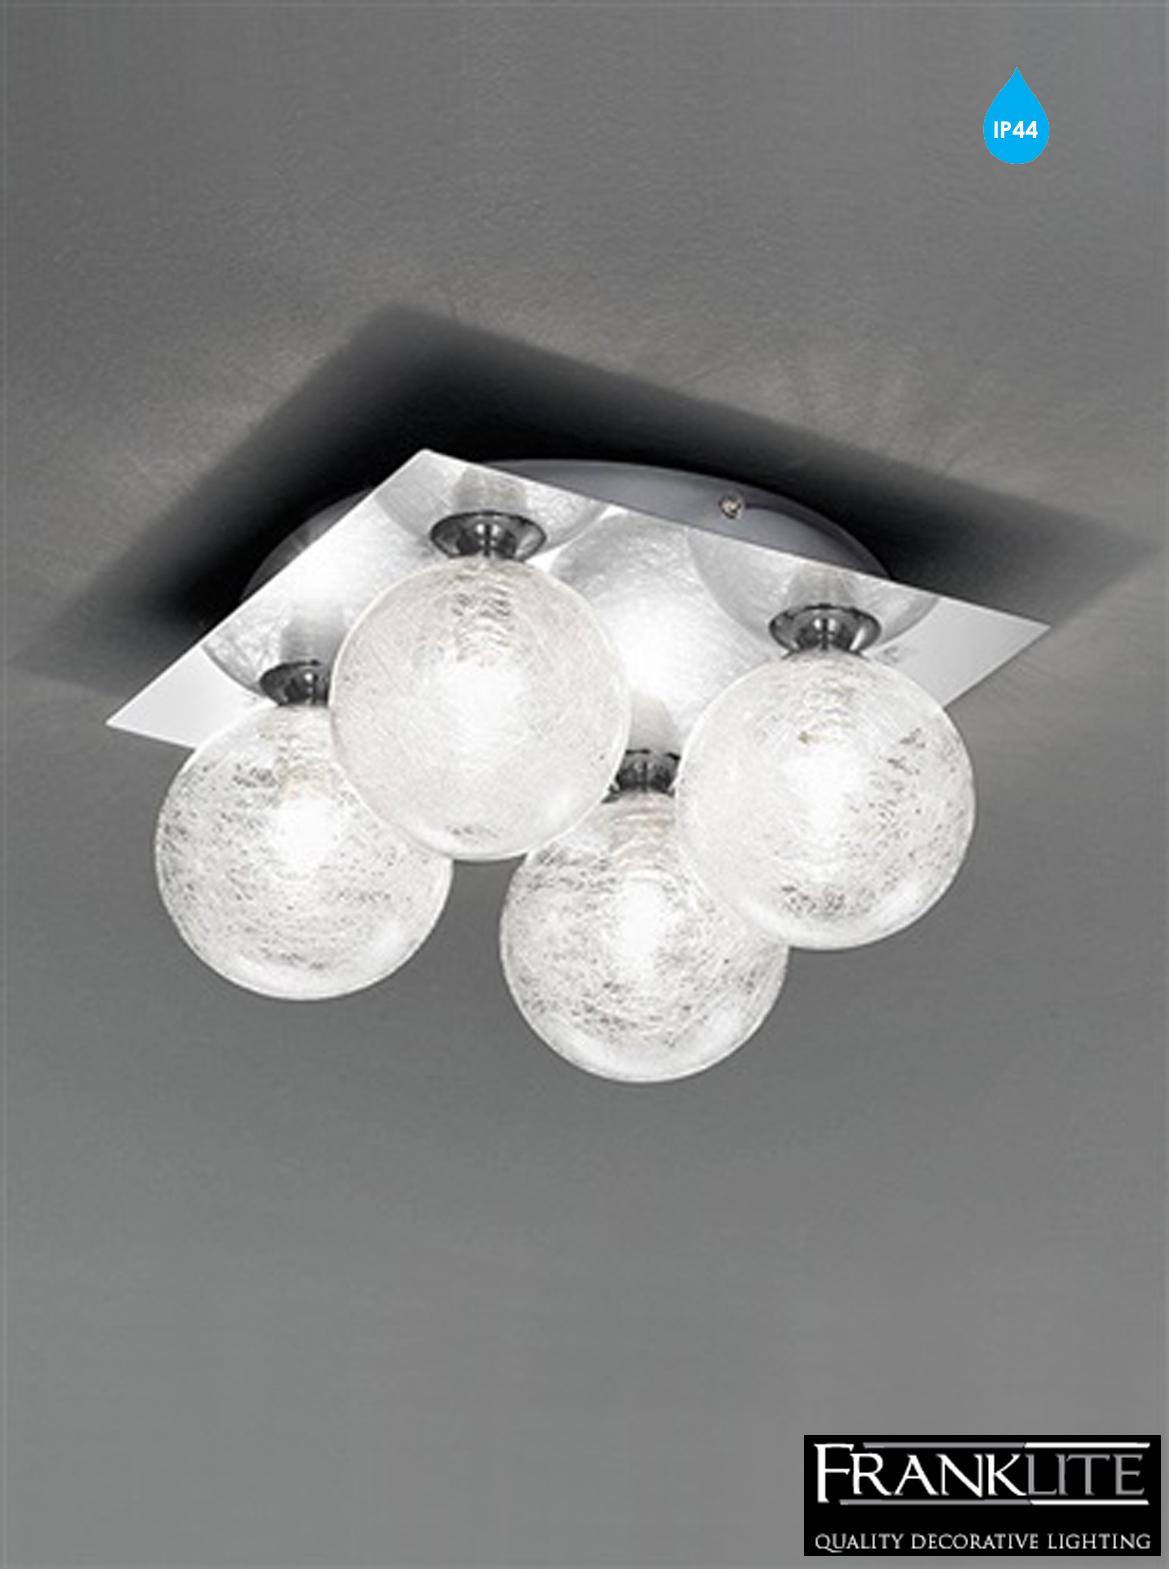 Bathroom Ceiling Lights Ip44 : Franklite glass chrome square light ip bathroom